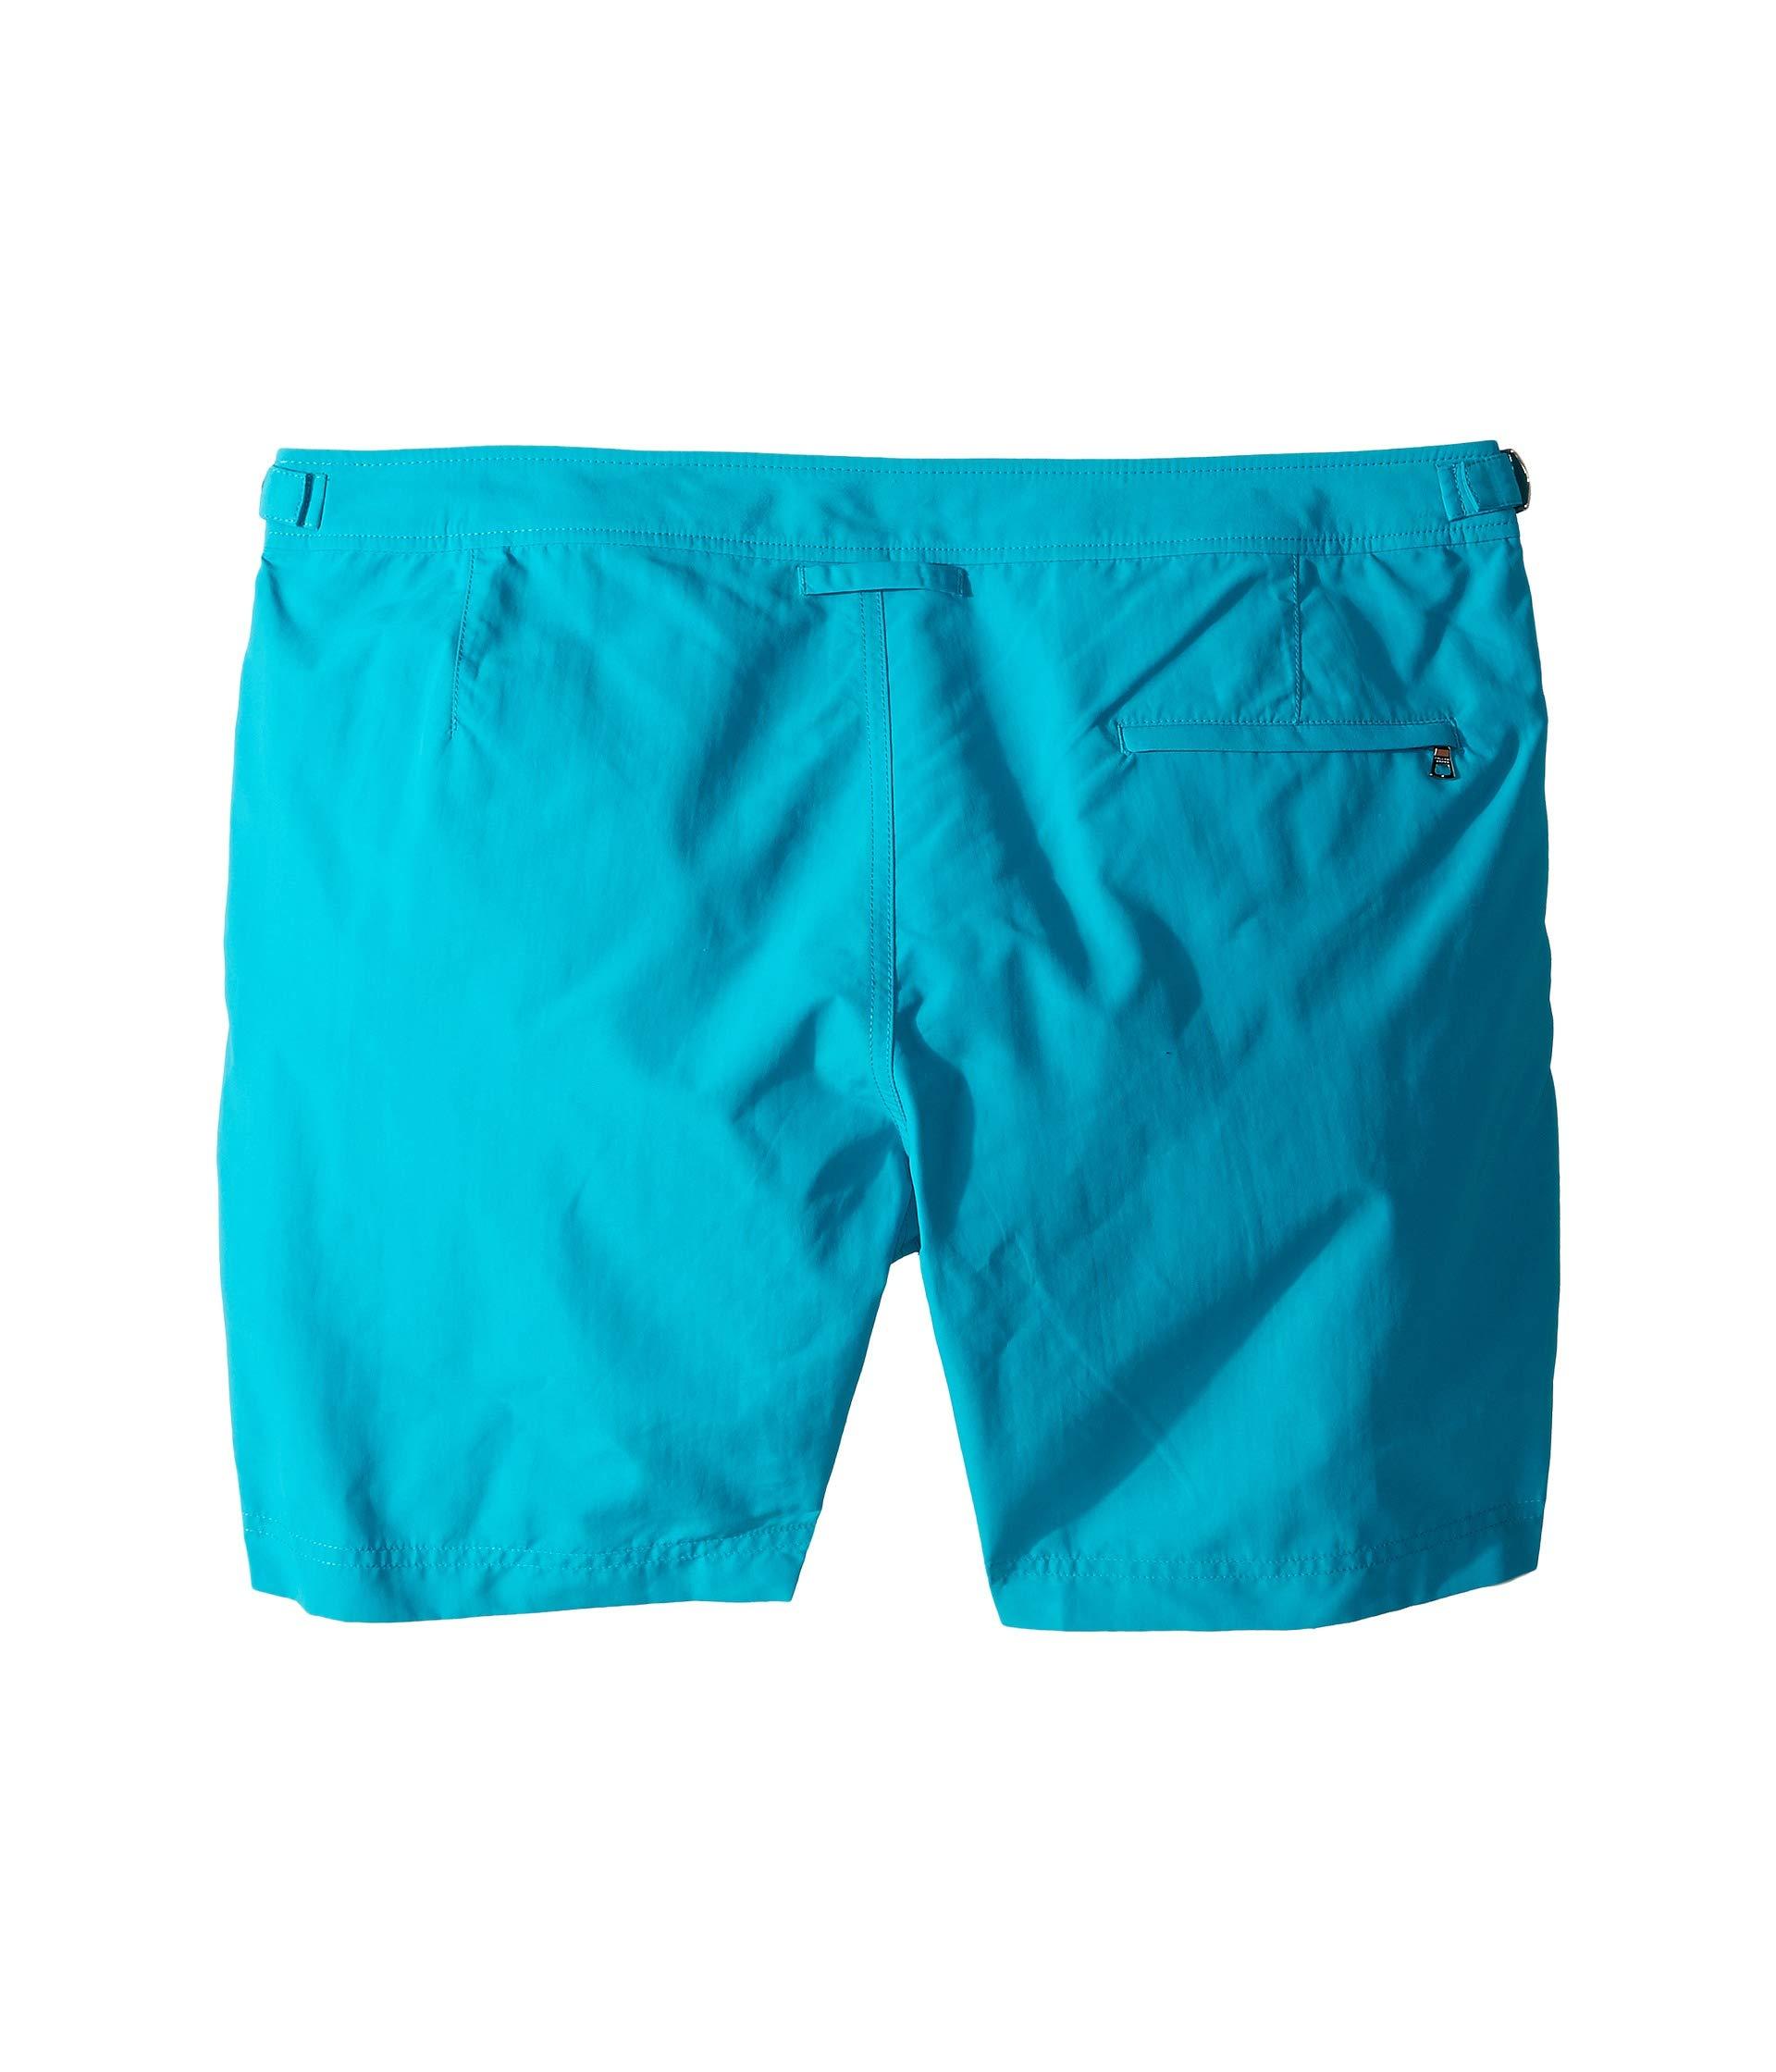 Bulldog Brown Blue Swim Trunk Orlebar Scuba Faqffv